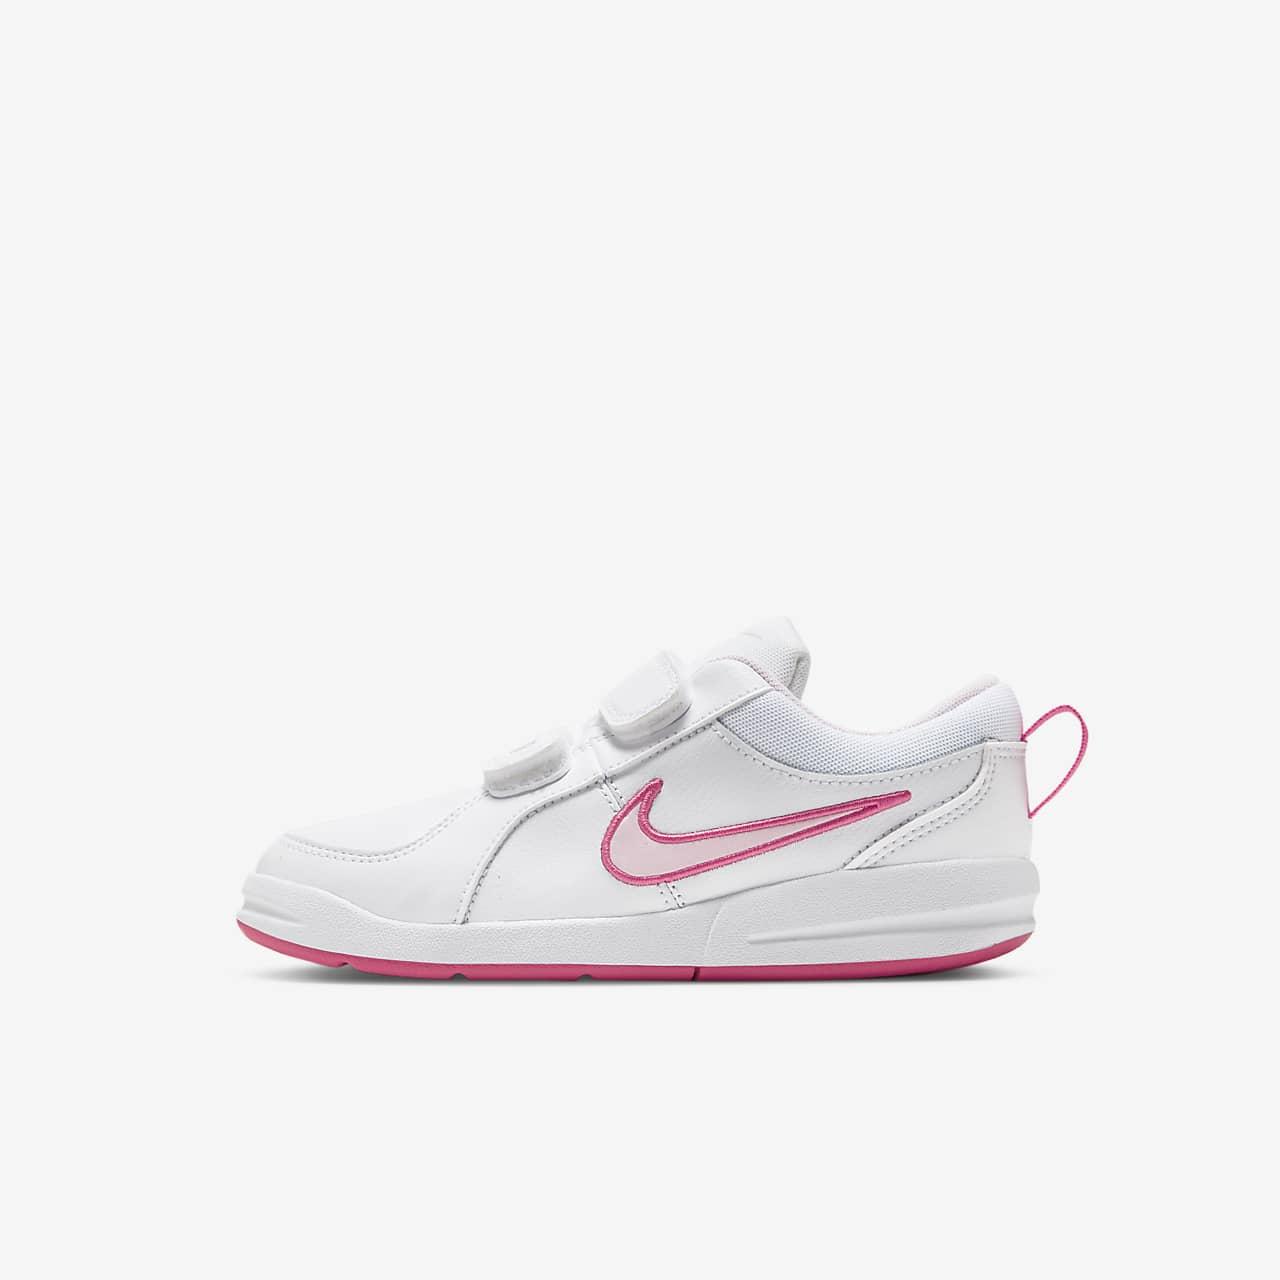 wholesale dealer a499f 4bad3 ... Nike Pico 4 (10–2.5) Girls  Shoe